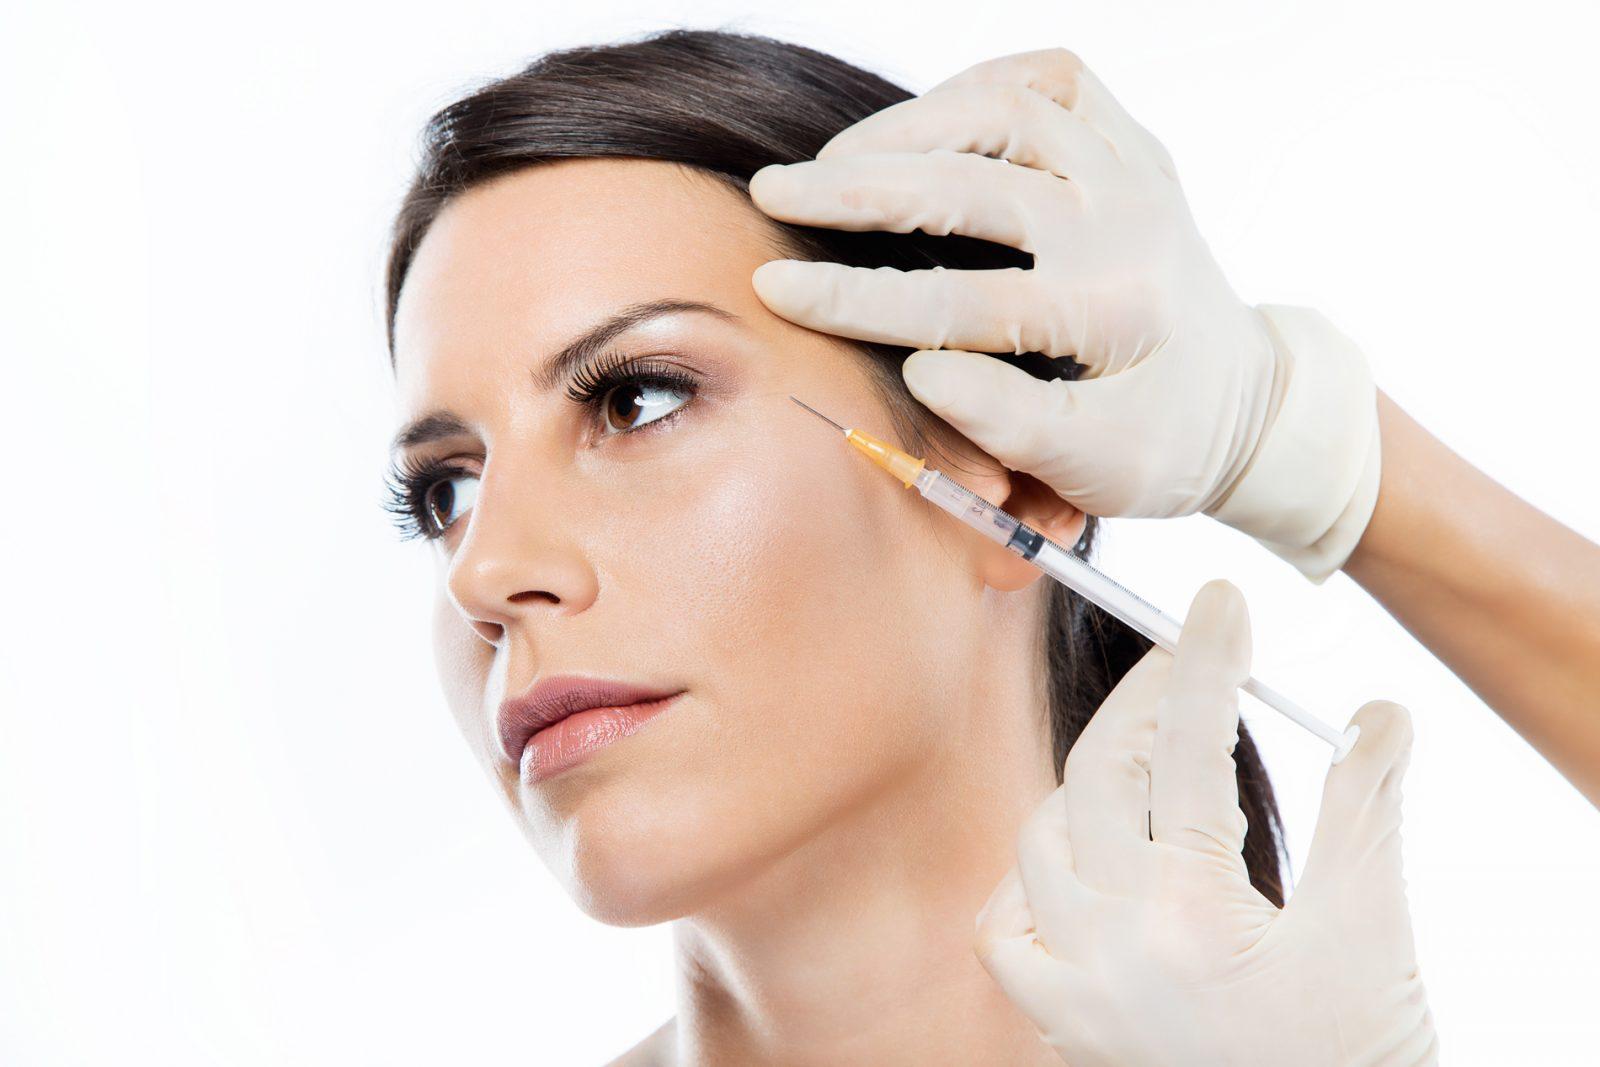 clinica, bodycience, Aplicação Toxina Botulínica